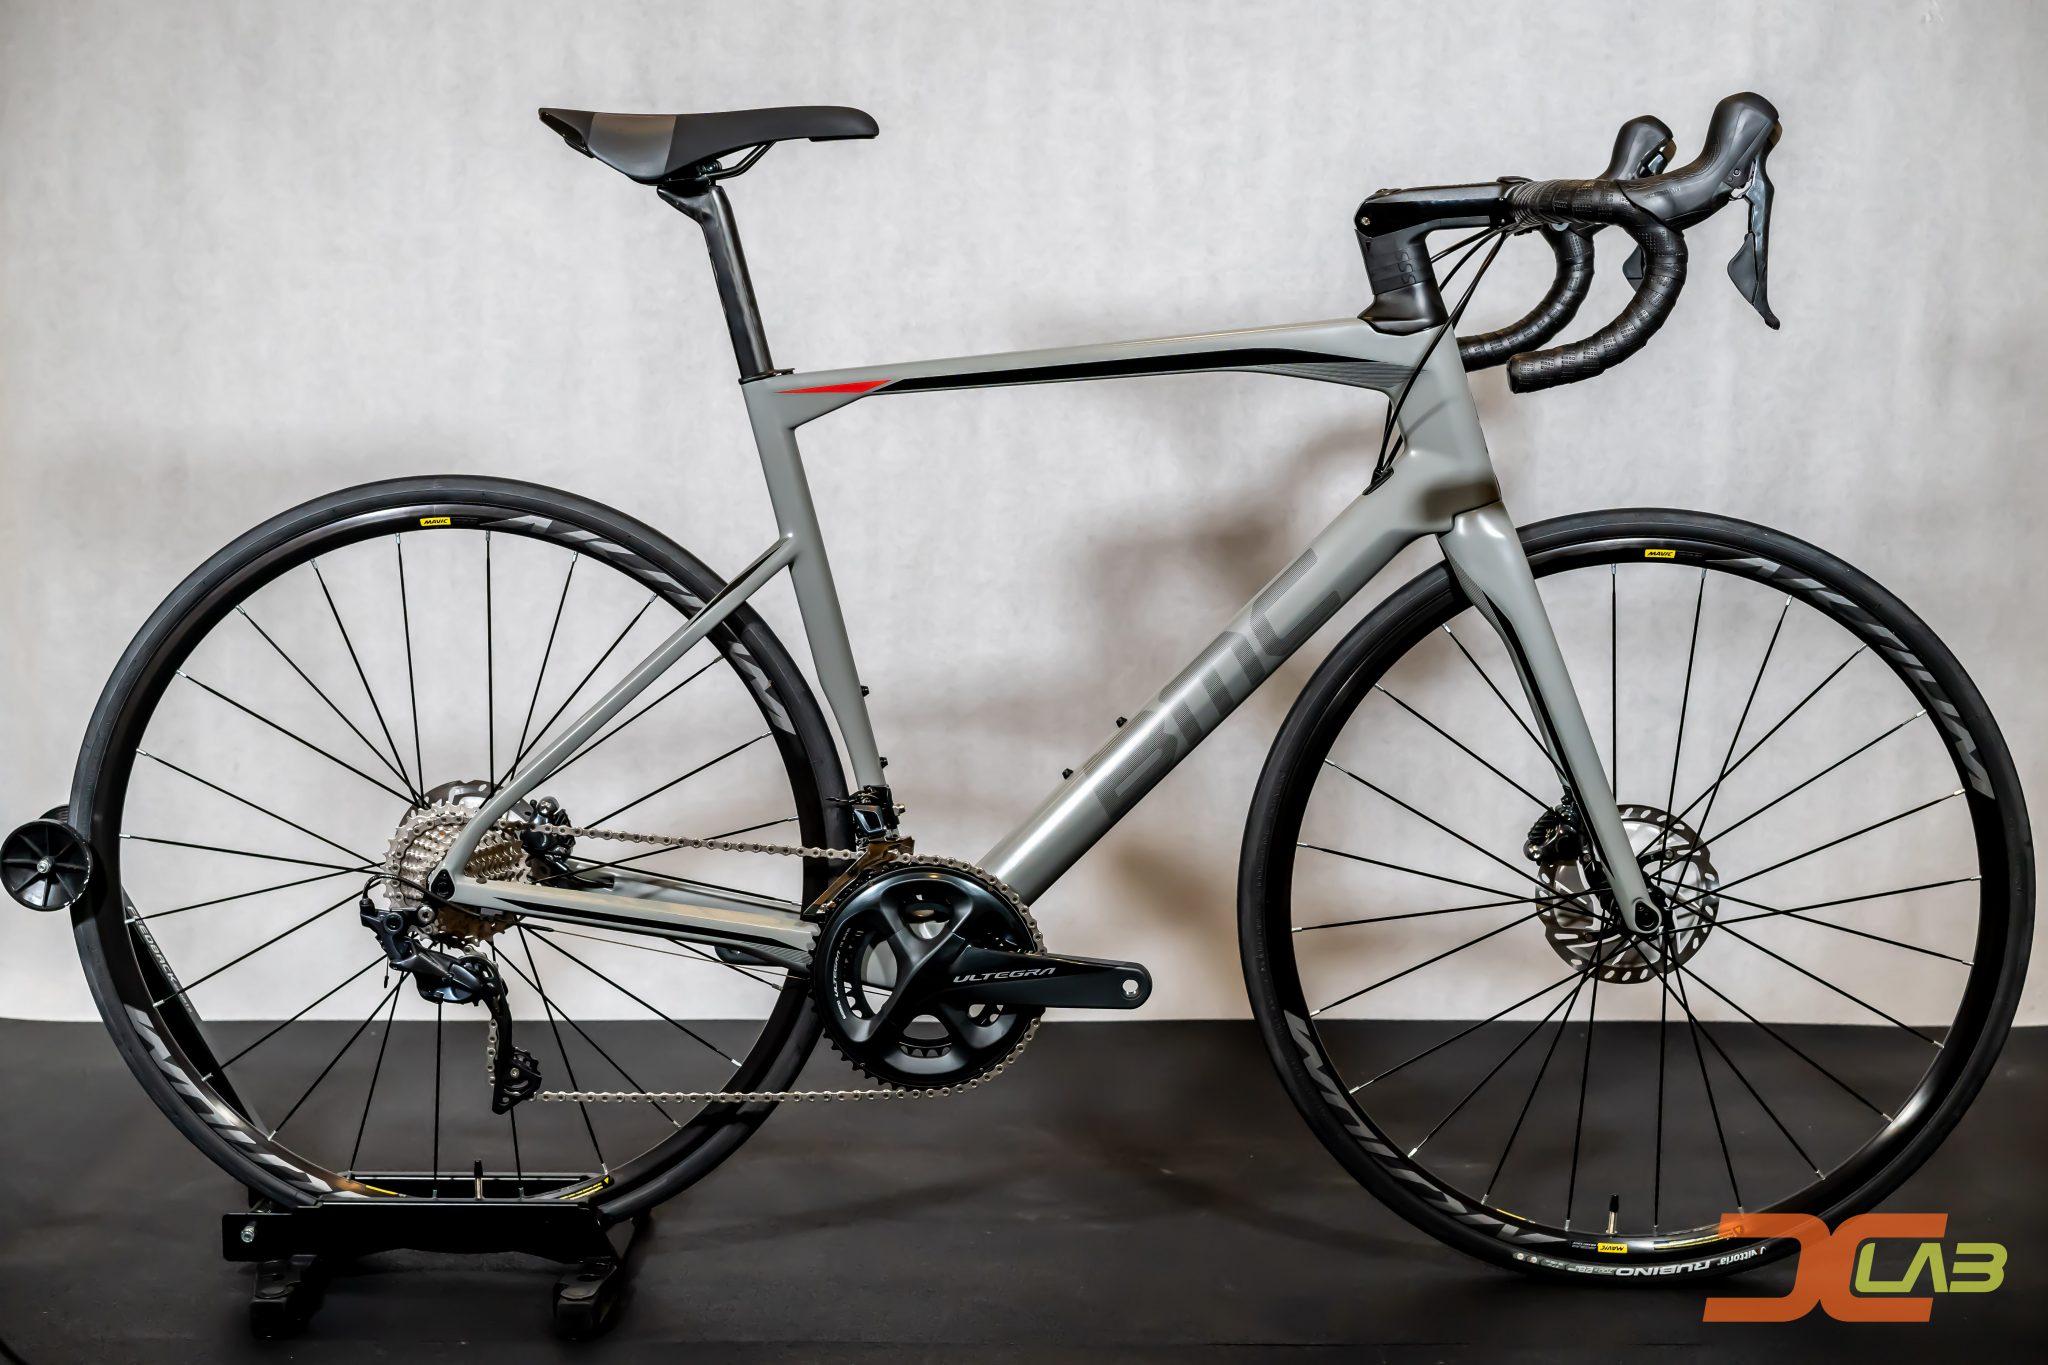 e3784ec21b9 2019 BMC Roadmachine 02 TWO - (54cm) | Dialed Cycling Lab